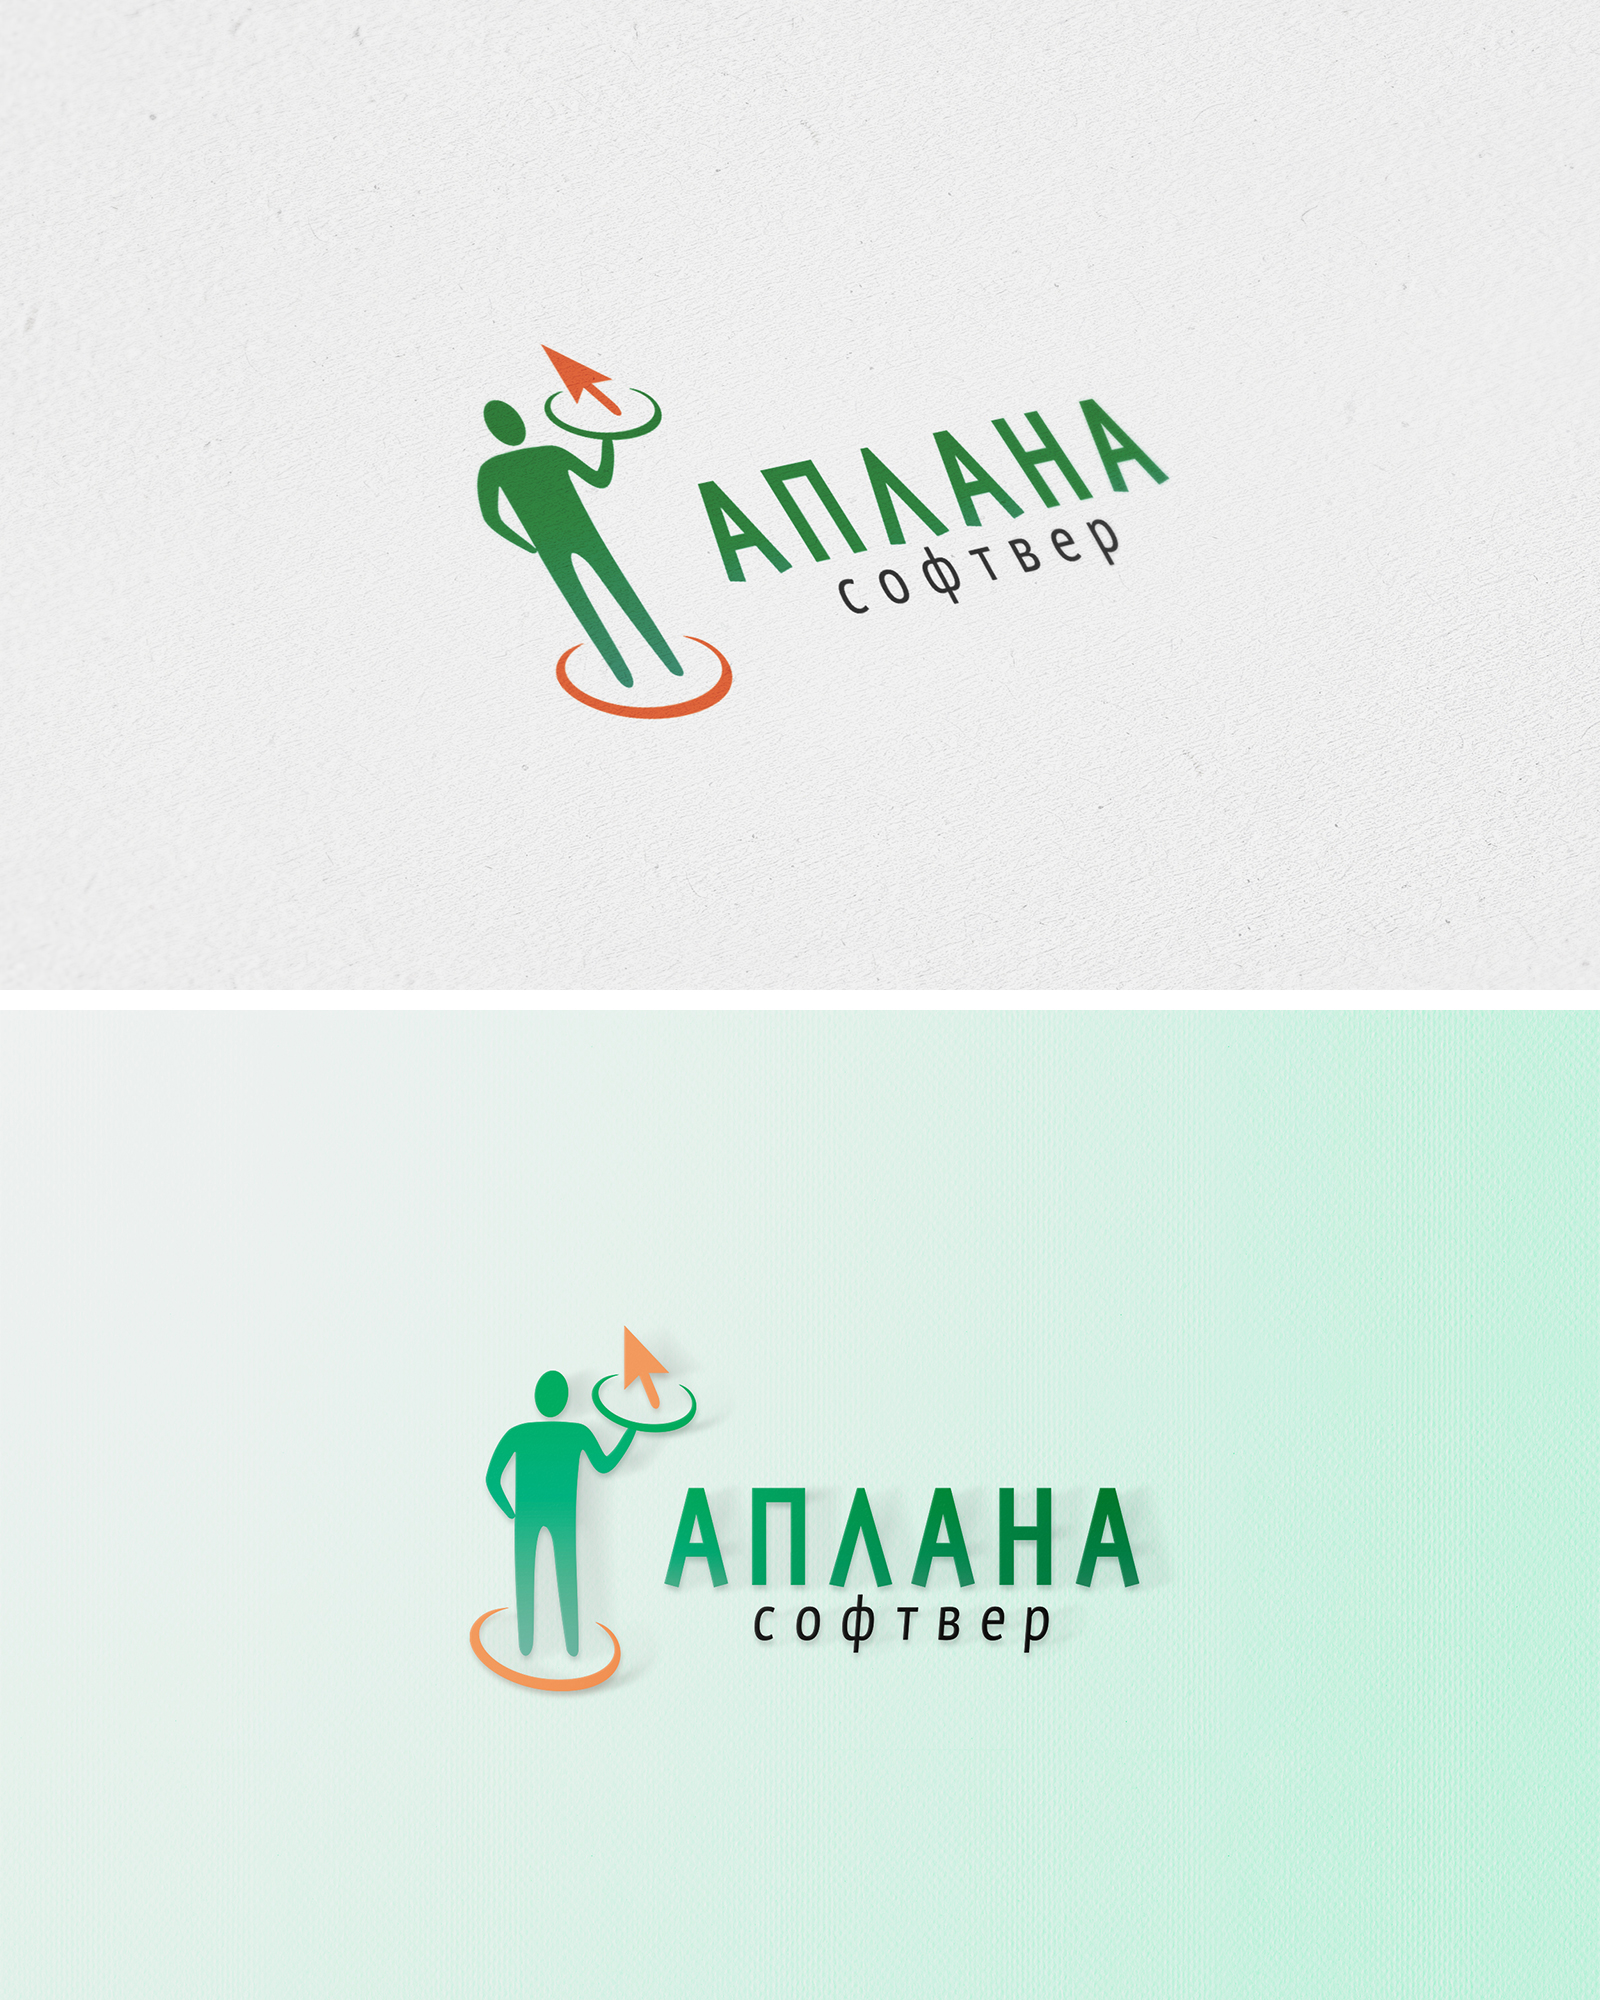 Редизайн логотипа для IT-компании